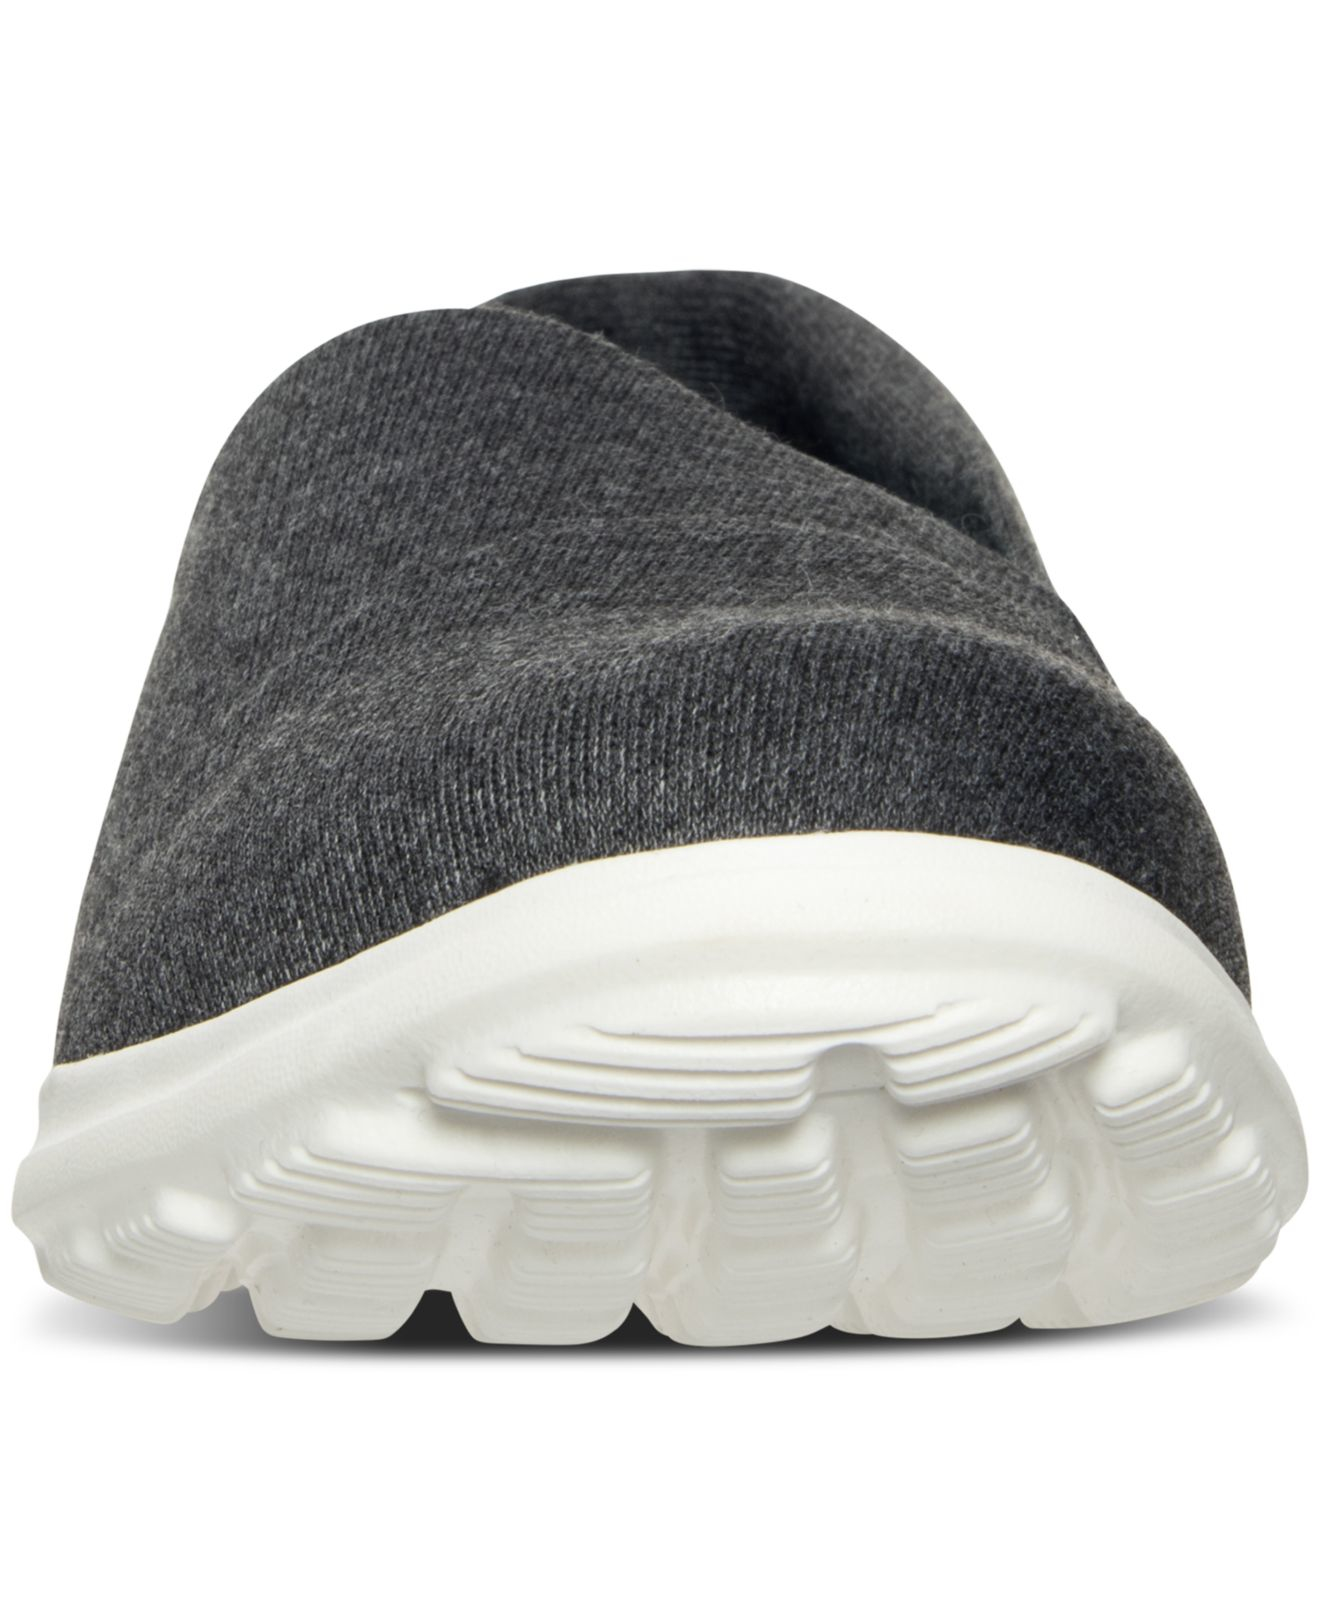 bfbb8479e50 Lyst - Reebok Women s Skyscape Harmony Walking Sneakers From Finish Line in  Gray